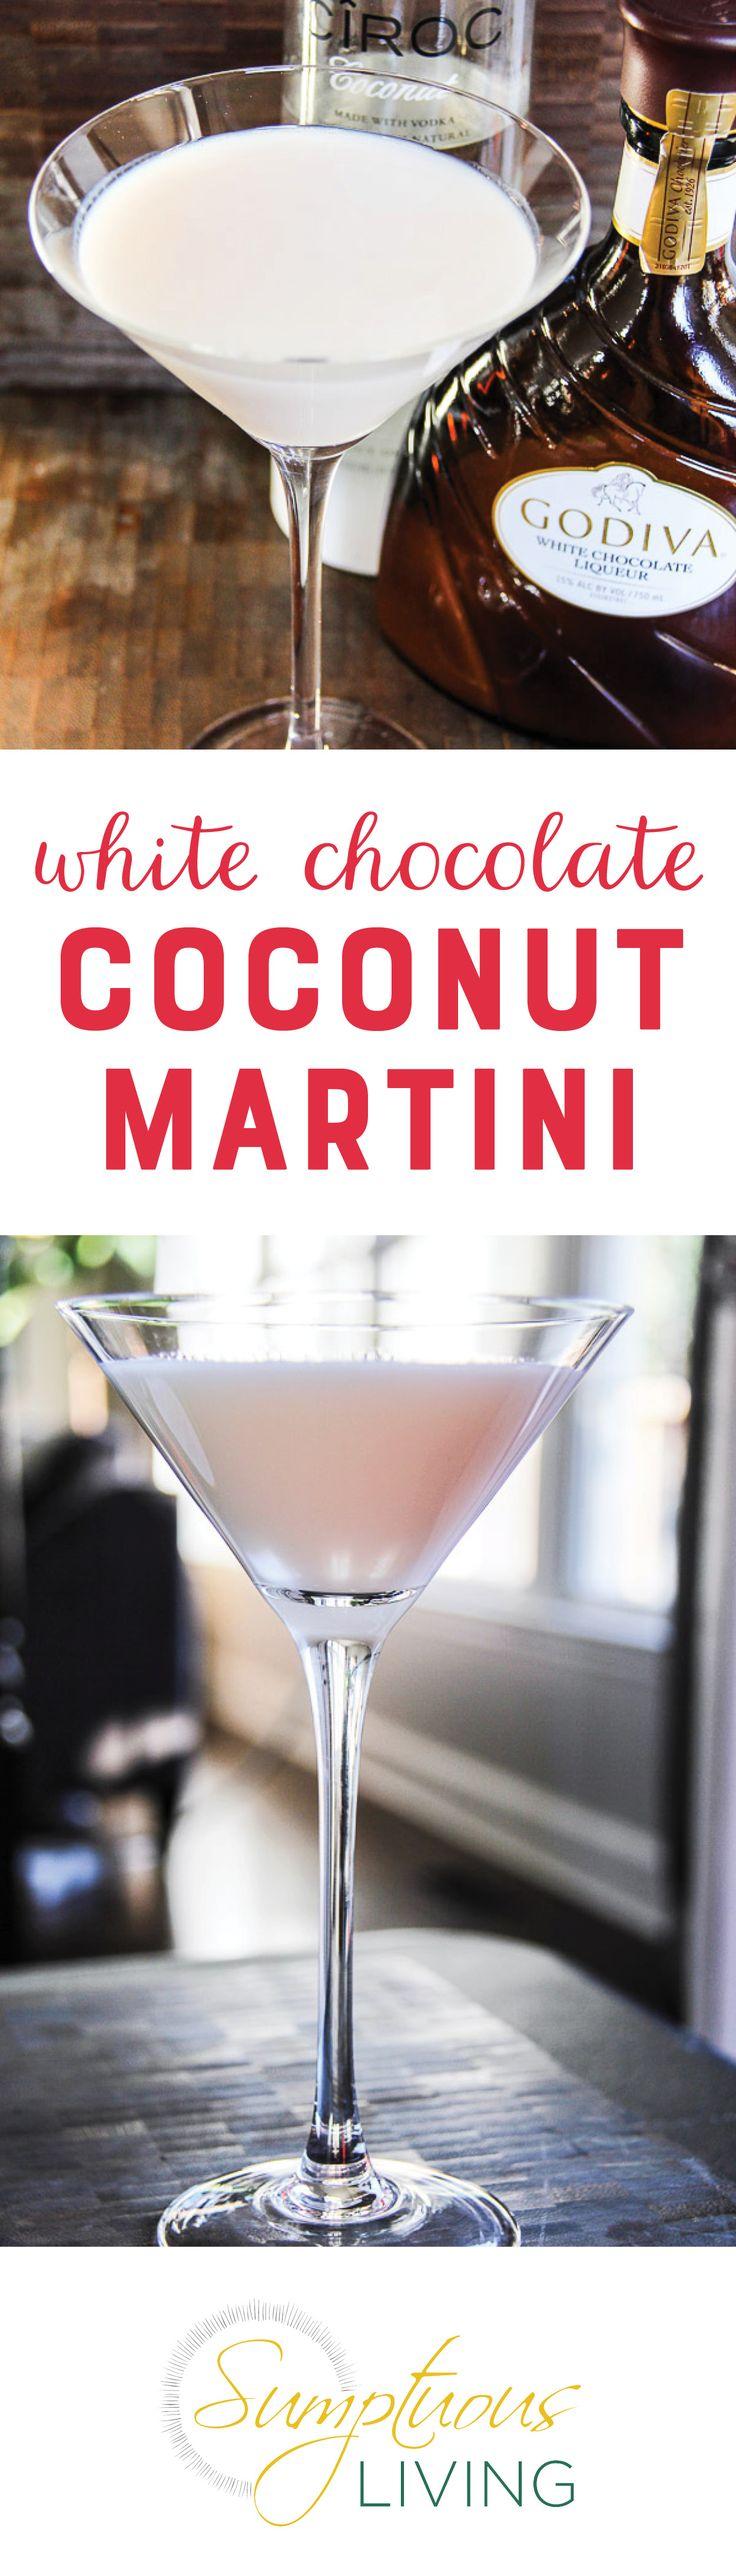 25+ best Chocolate martini recipes ideas on Pinterest   Chocolate ...